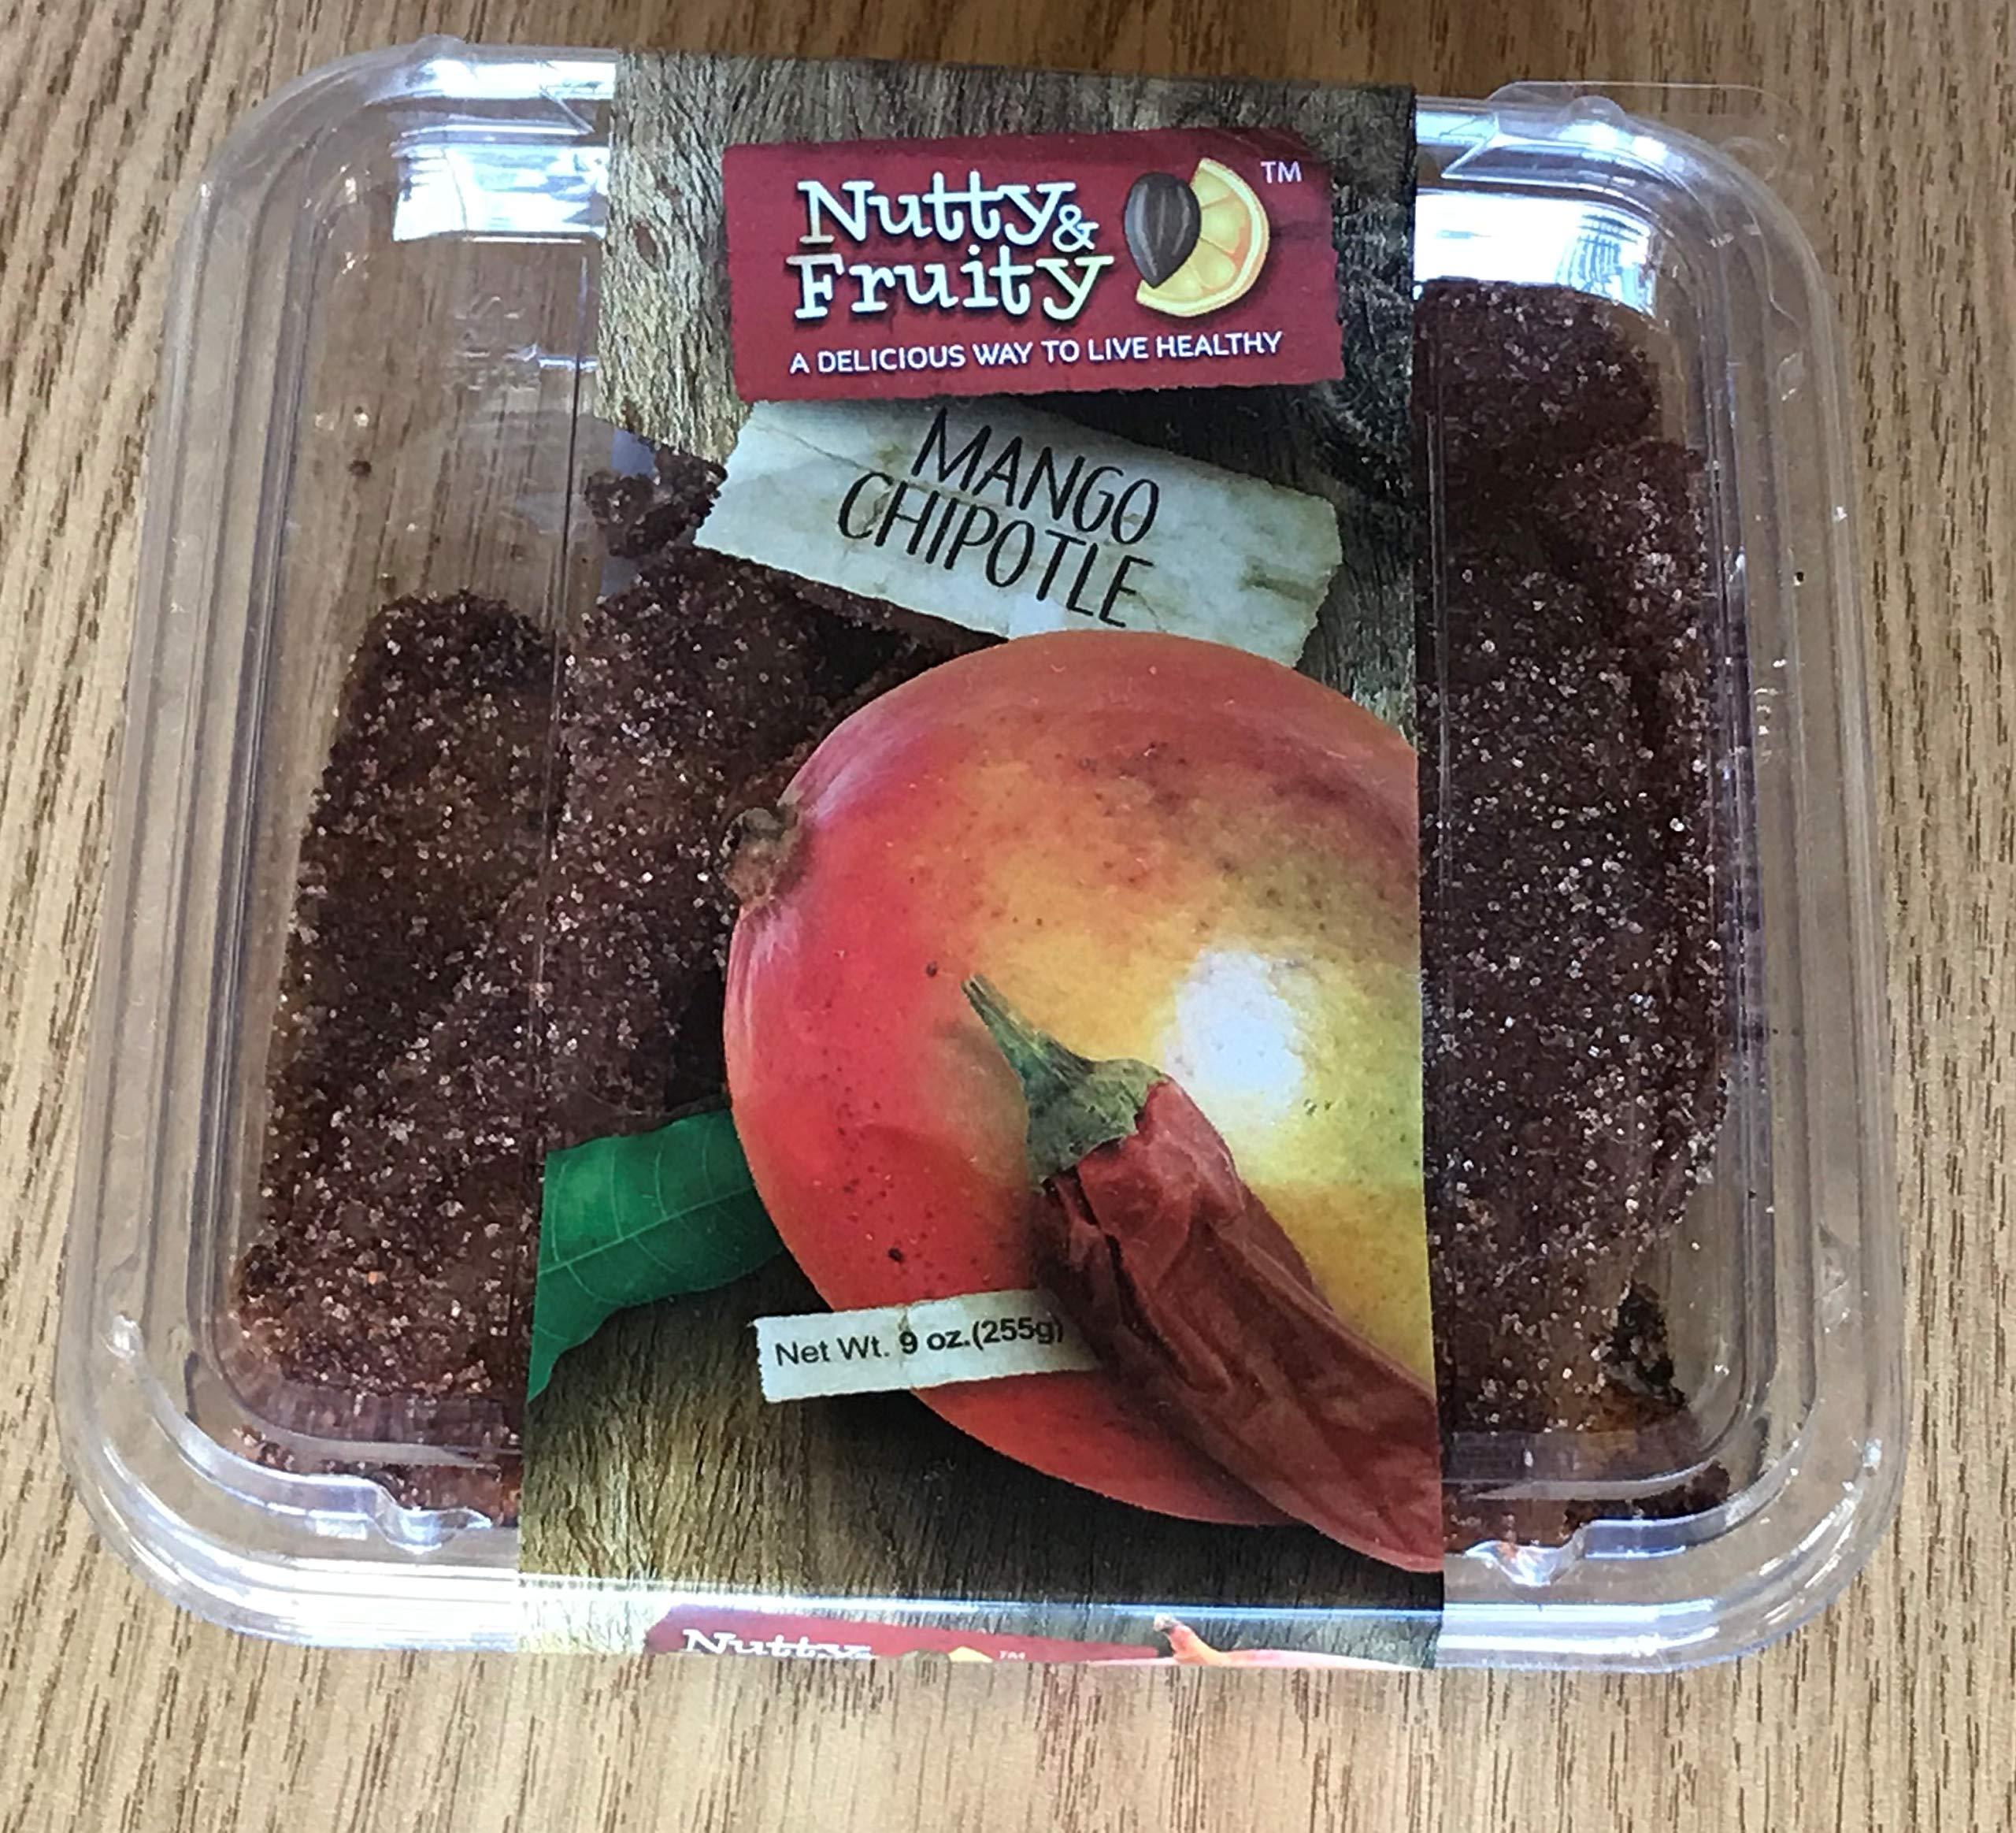 Nutty & Fruity Dried Mango Chipotle 9 oz, 255g